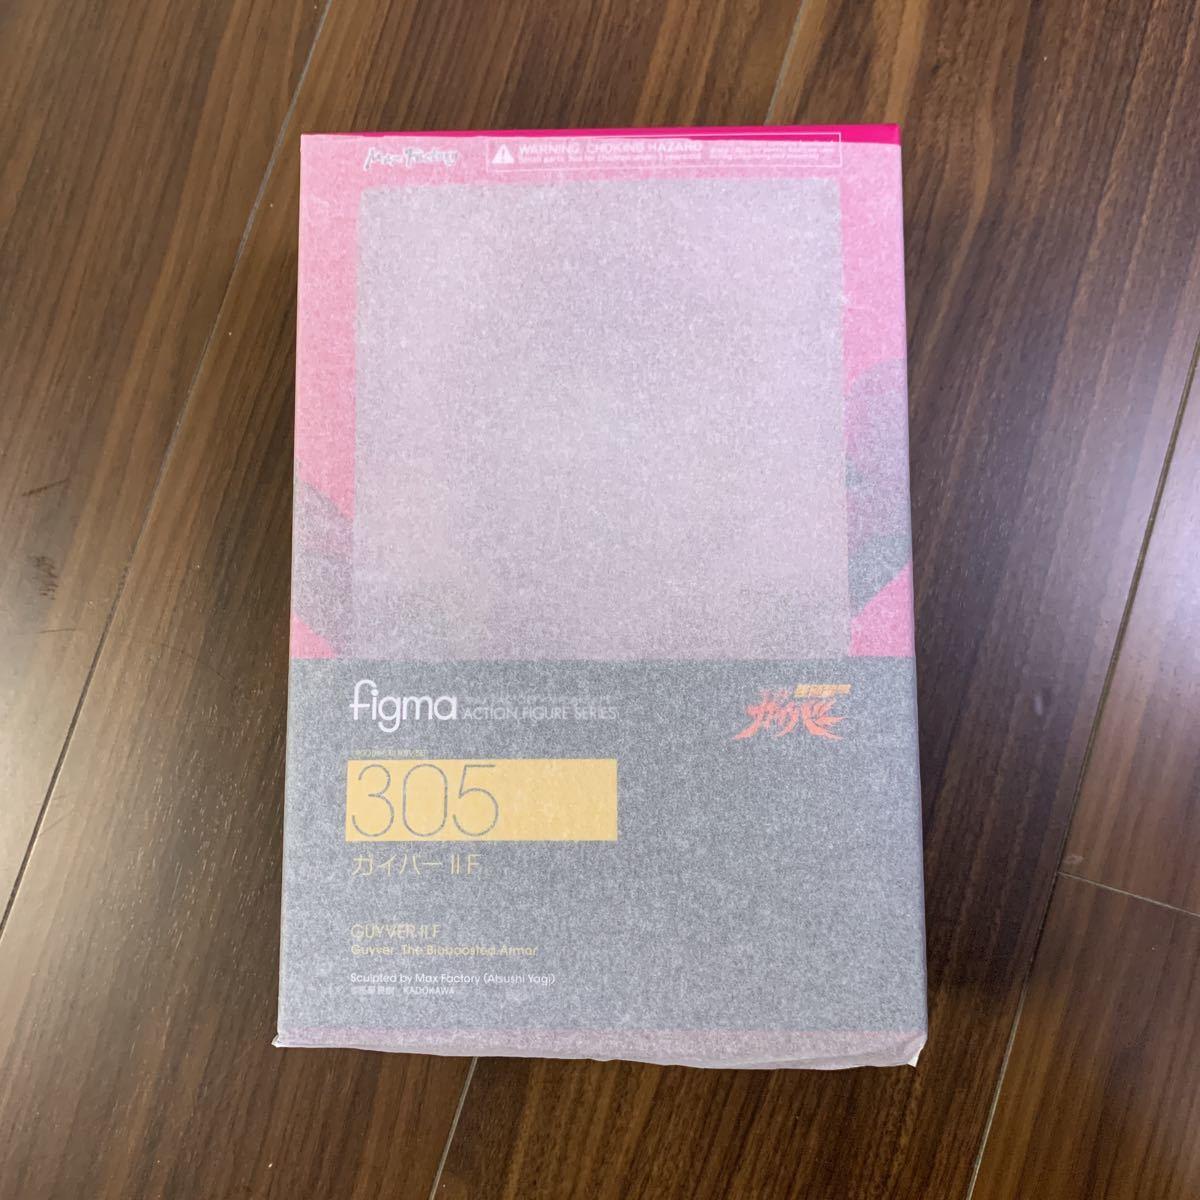 figma No.305 ガイバーII F 強殖装甲ガイバー マックスファクトリー_画像1